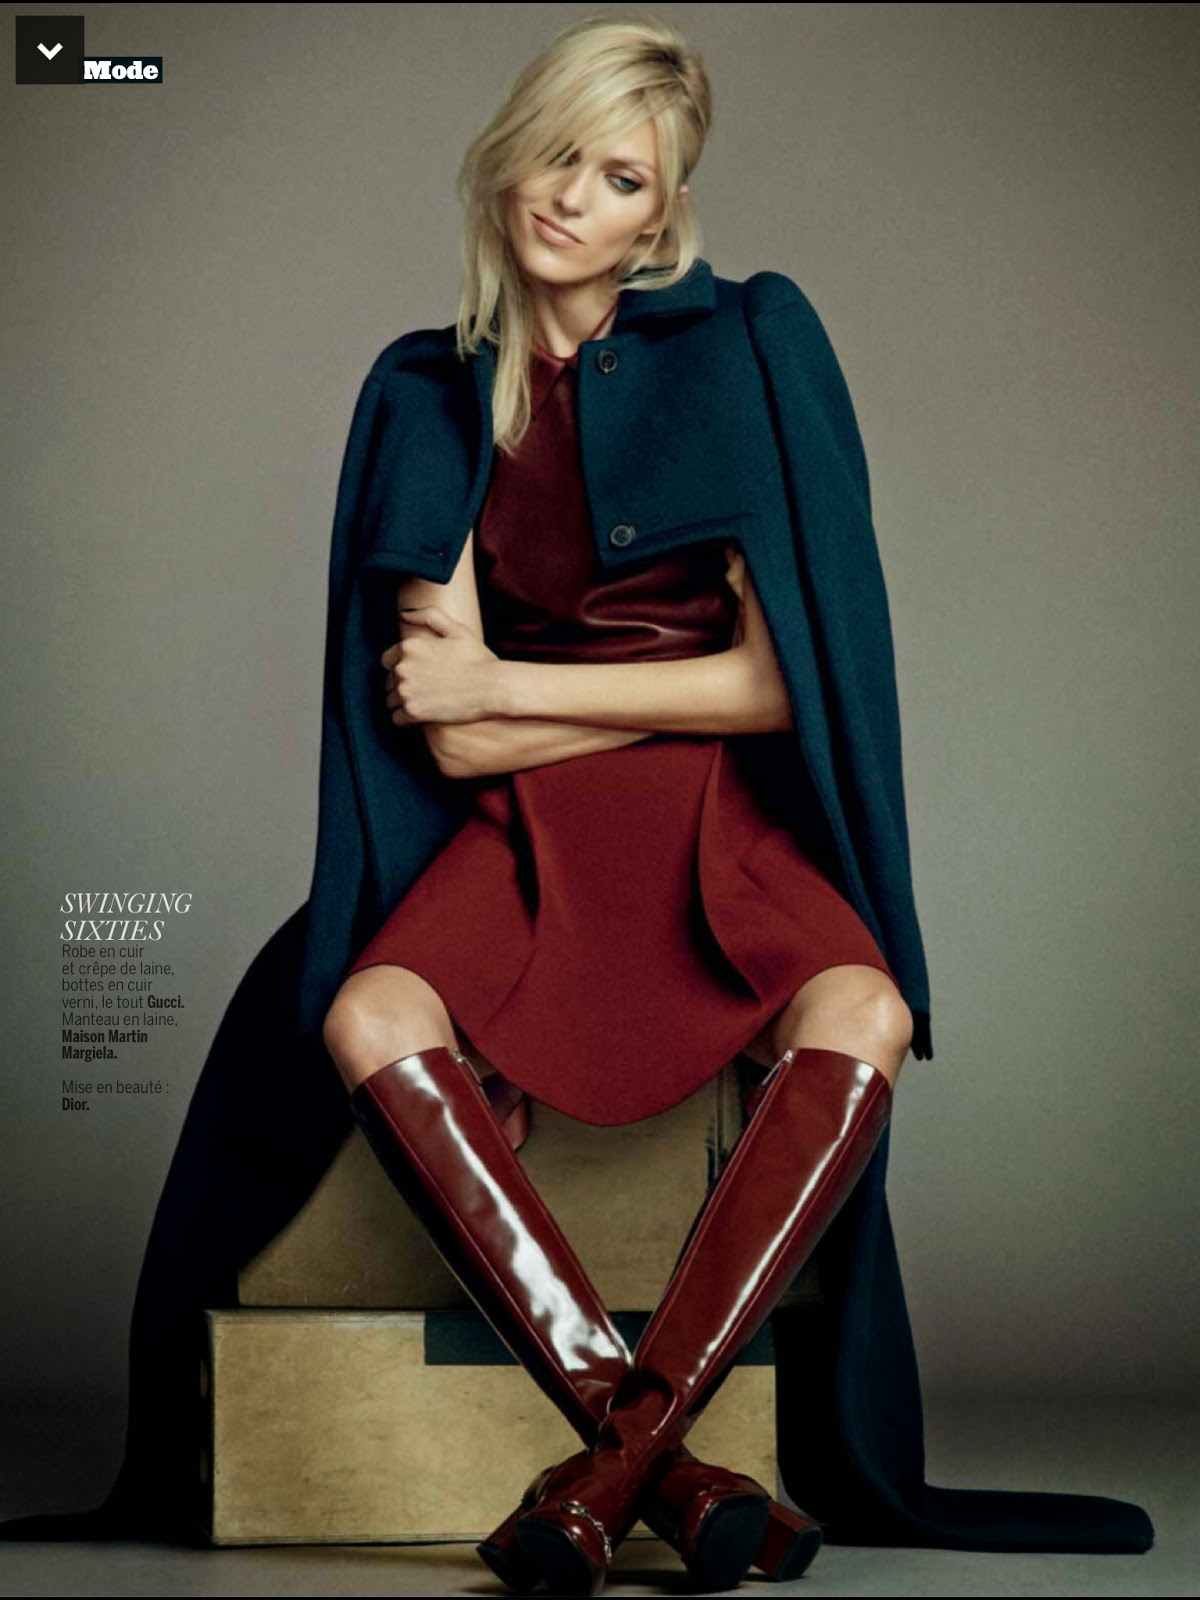 September 2014 Issue: Revue De Saison : Anja Rubik For L'Express Styles